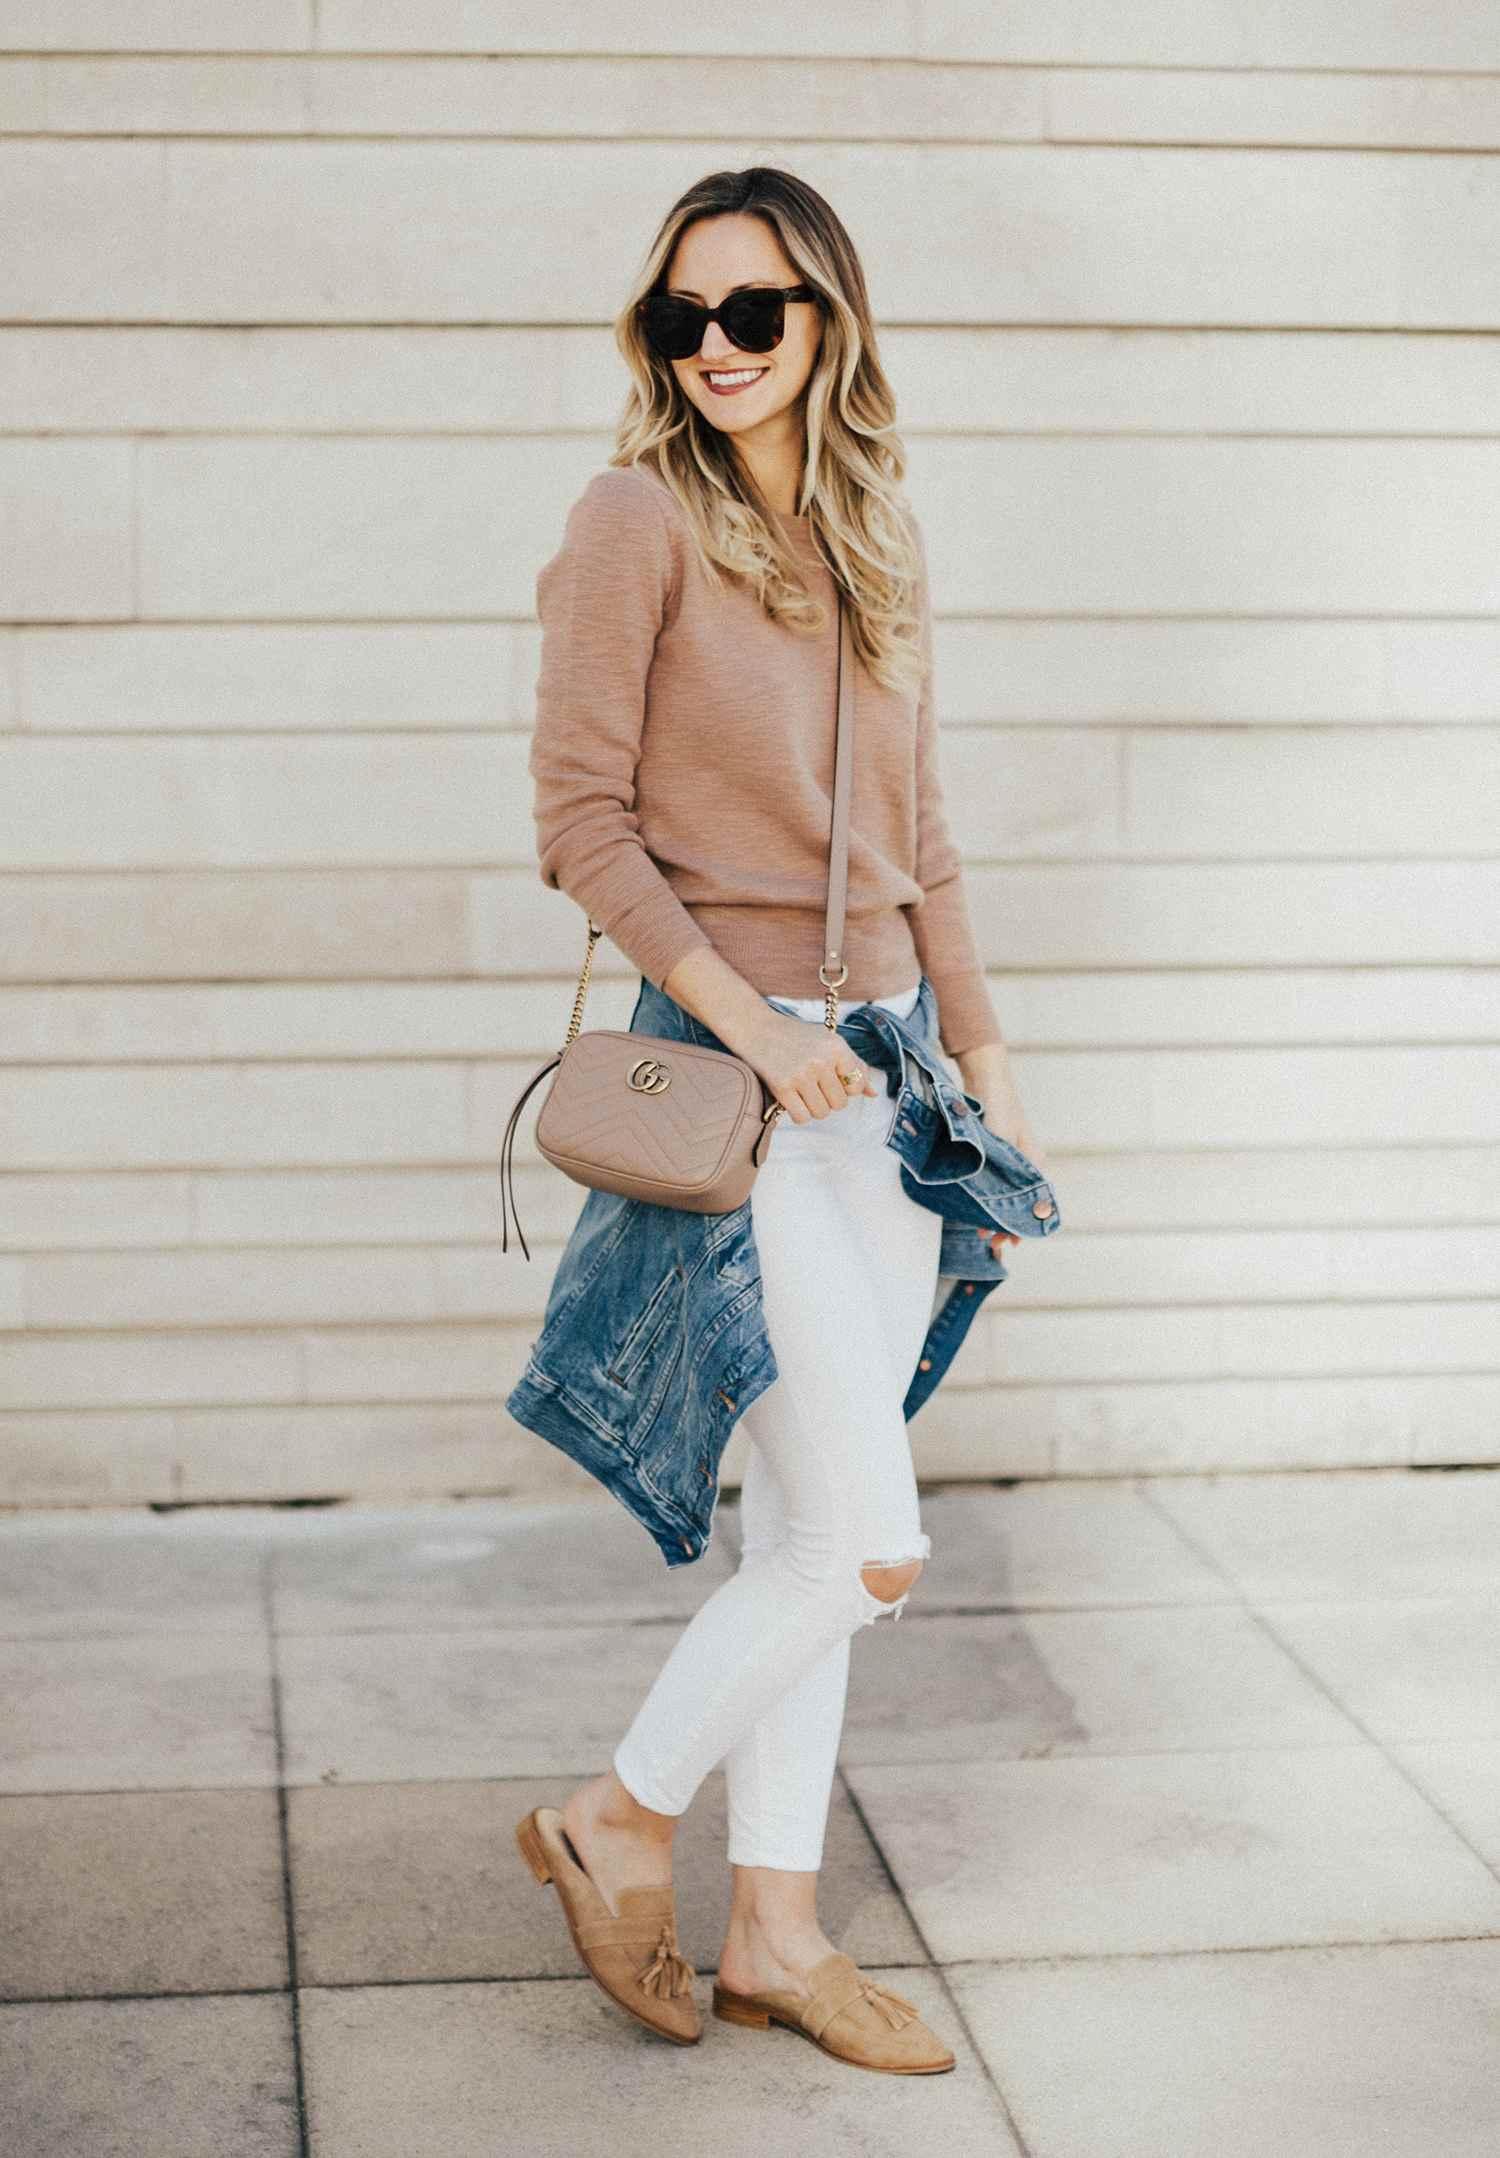 c166cda825cbc7 14 Chic Ways to Rock White Skinny Jeans